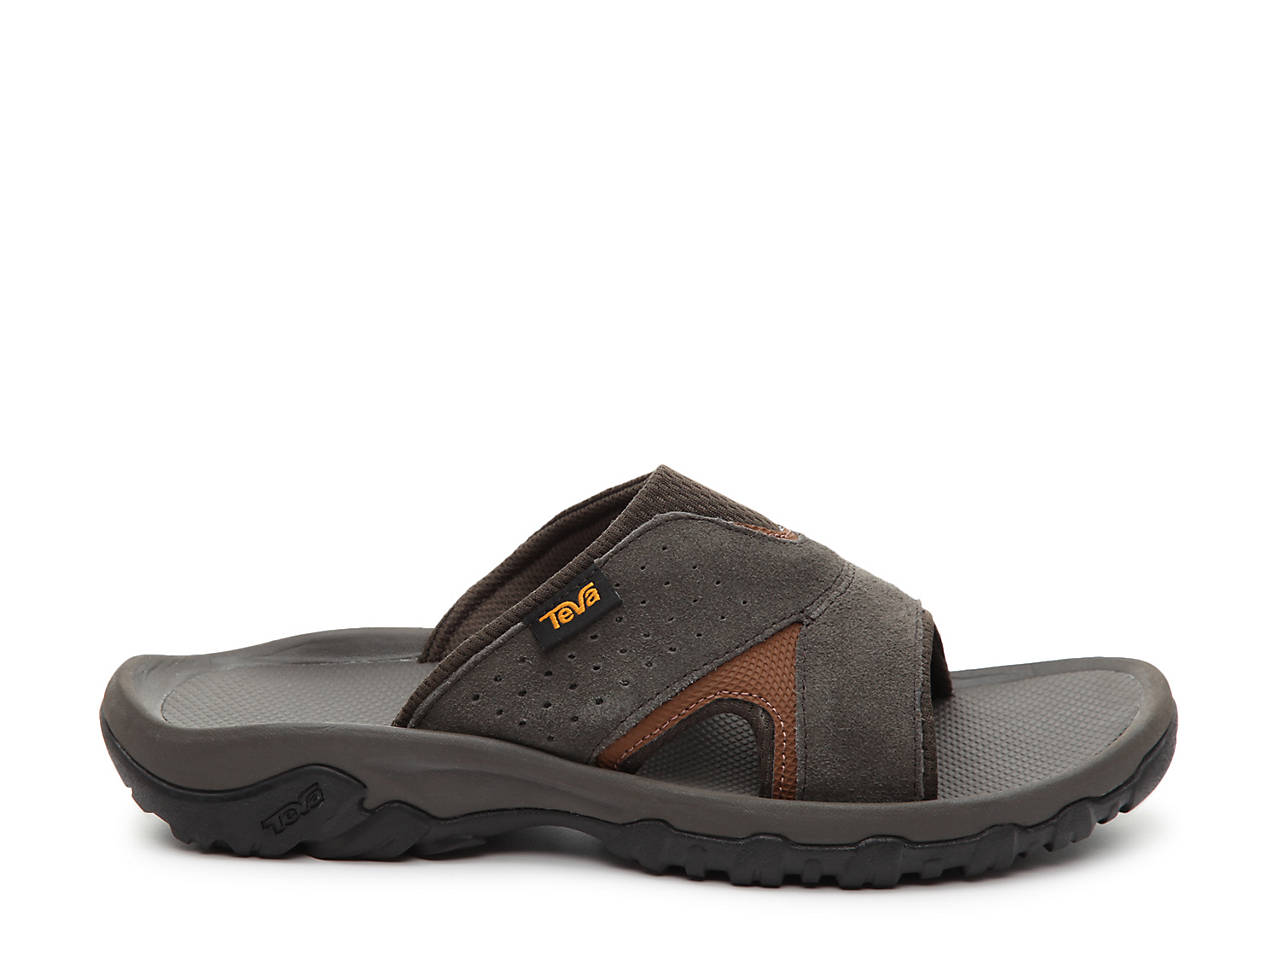 eee7c7c1e Teva Katavi 2 Slide Sandal Men s Shoes